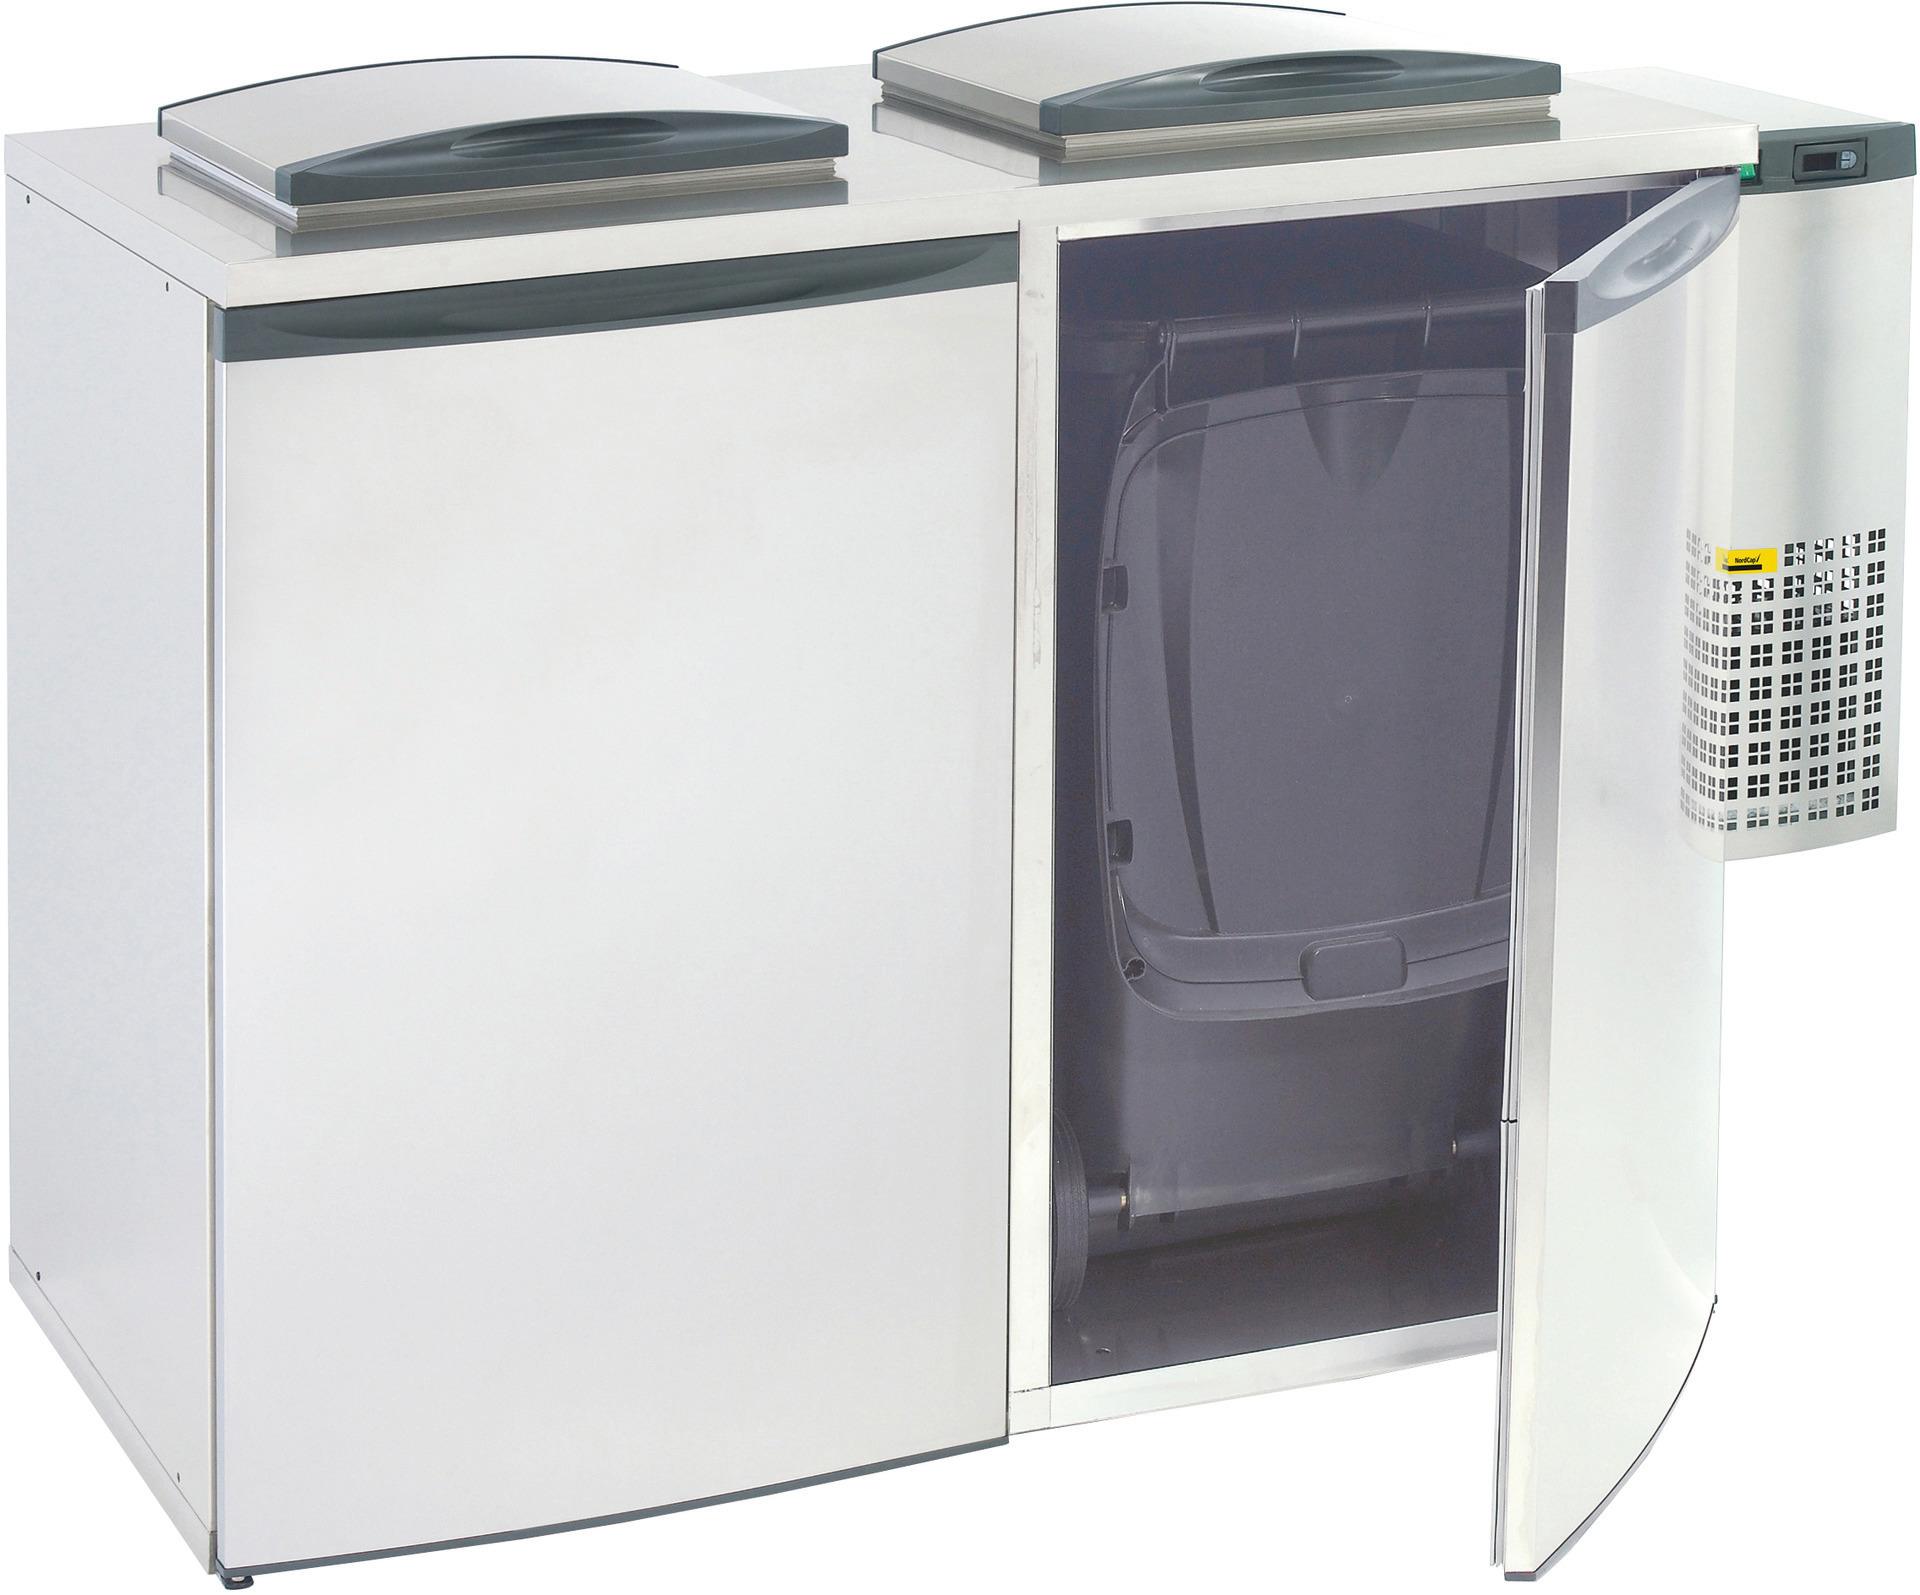 Abfall- / Konfiskatkühler für  2 x 240,00 l / steckerfertig